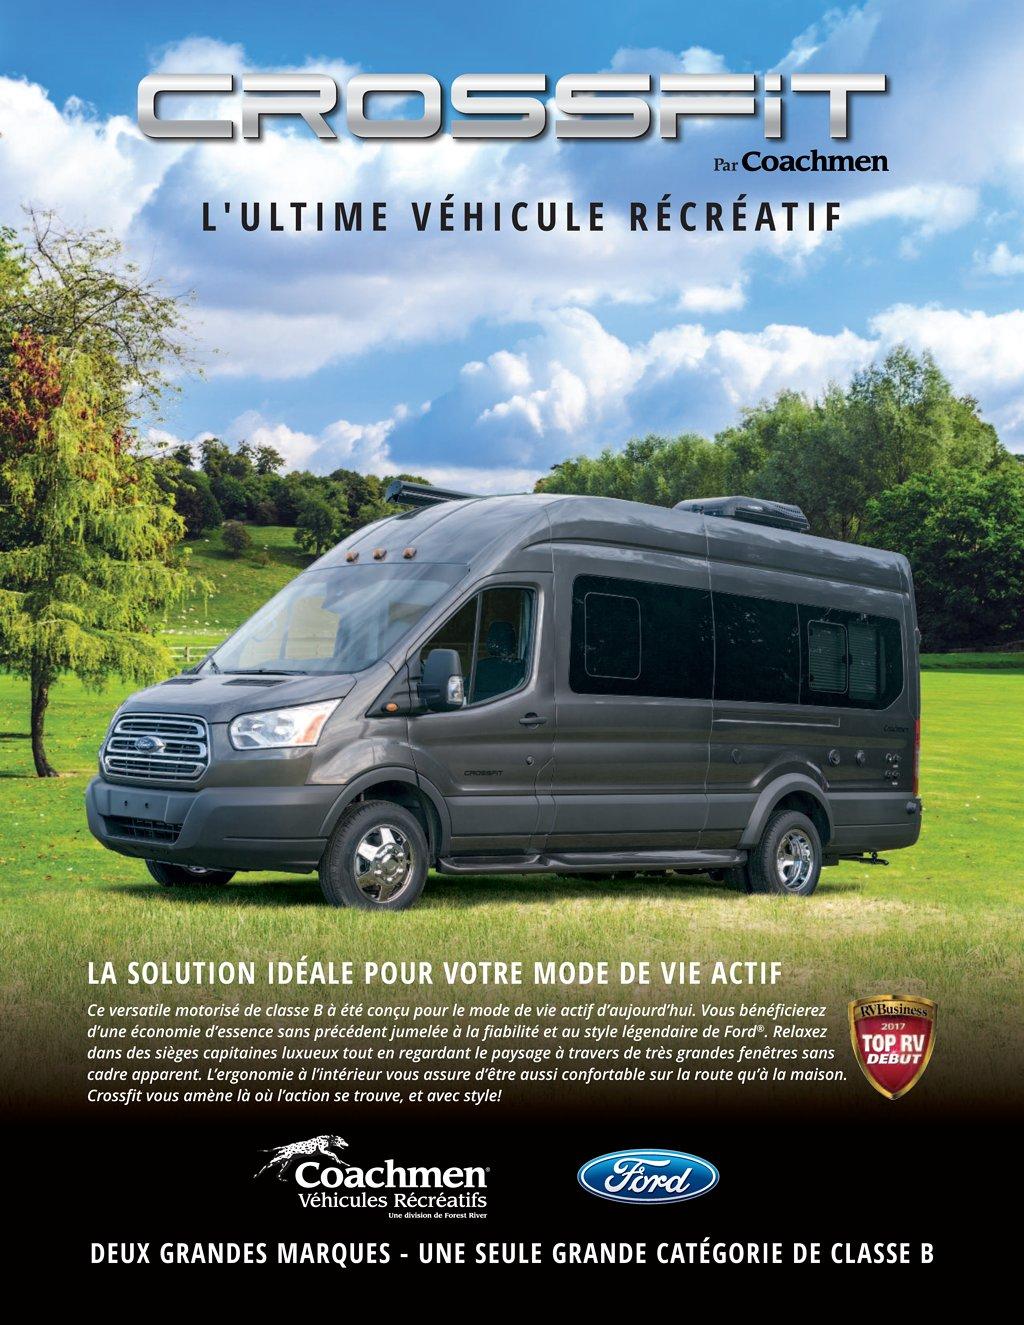 coachmen rv brochures floorplans and catalogs rv literature 2018 coachmen crossfit french brochure